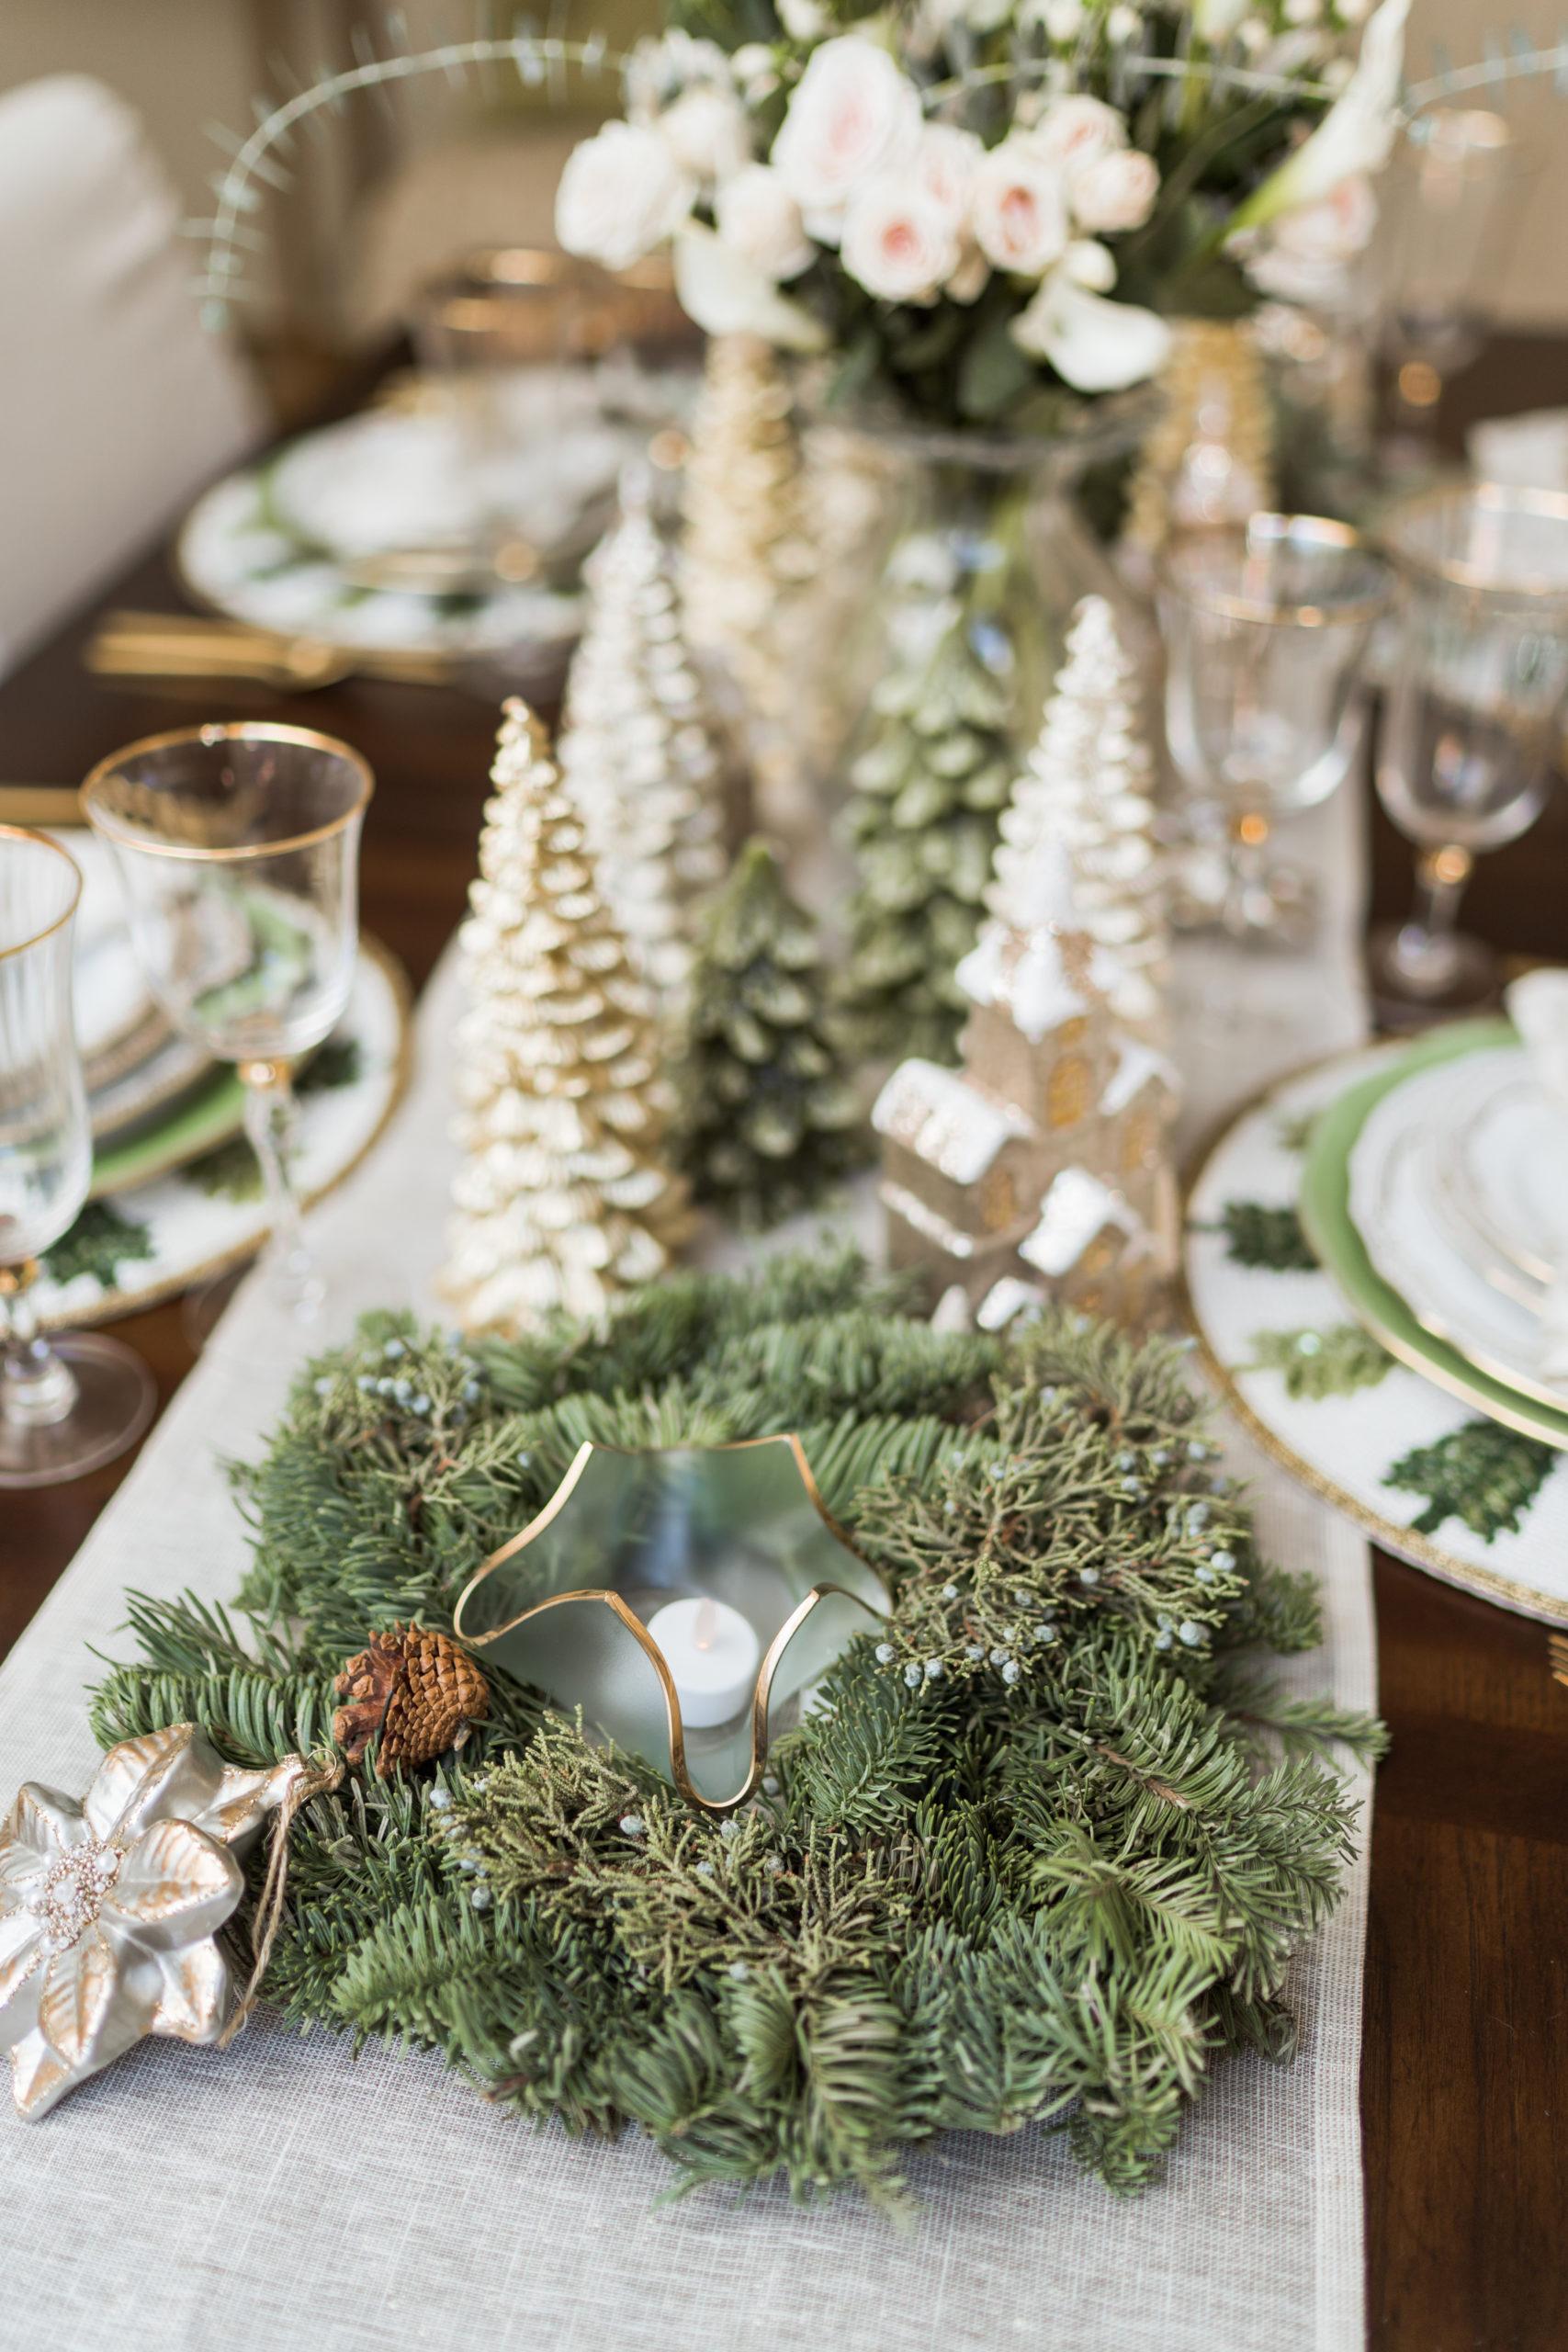 Evergreen wreathes for Christmas tabletop decor